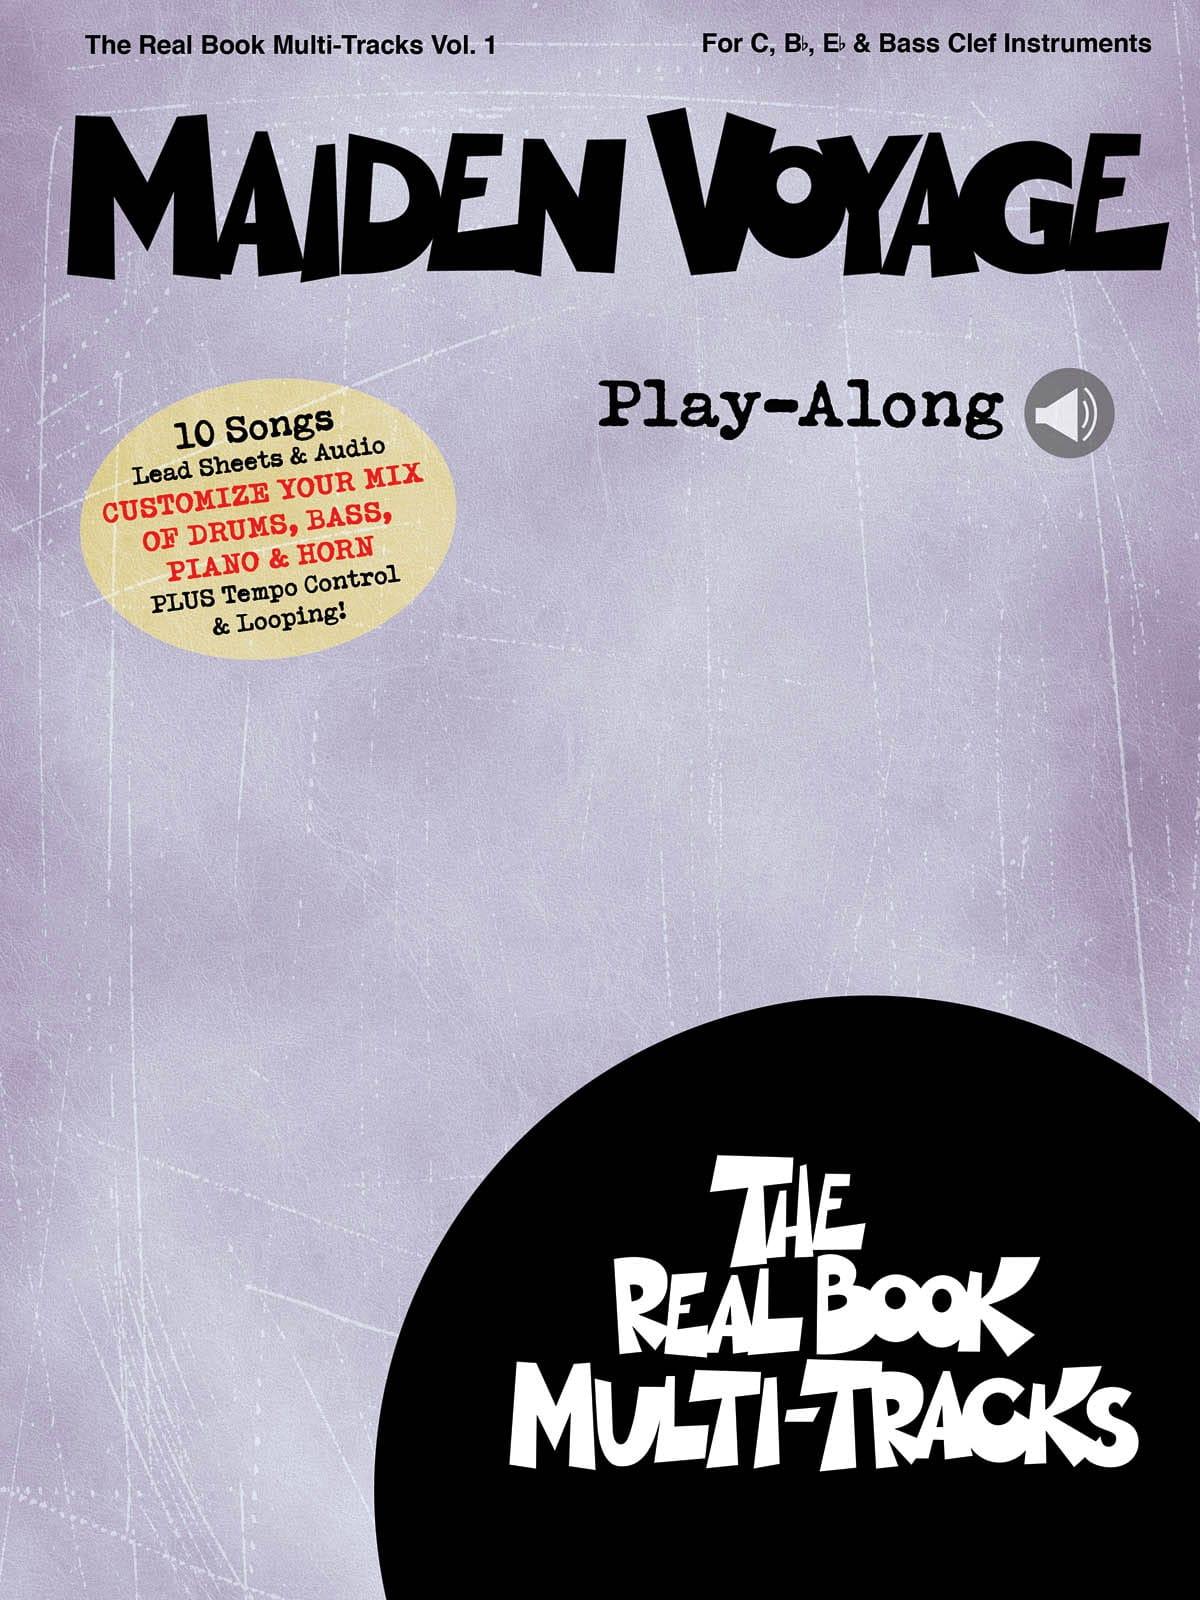 Real Book Multi-Tracks Volume 1 - Maiden Voyage Play-Along - laflutedepan.com